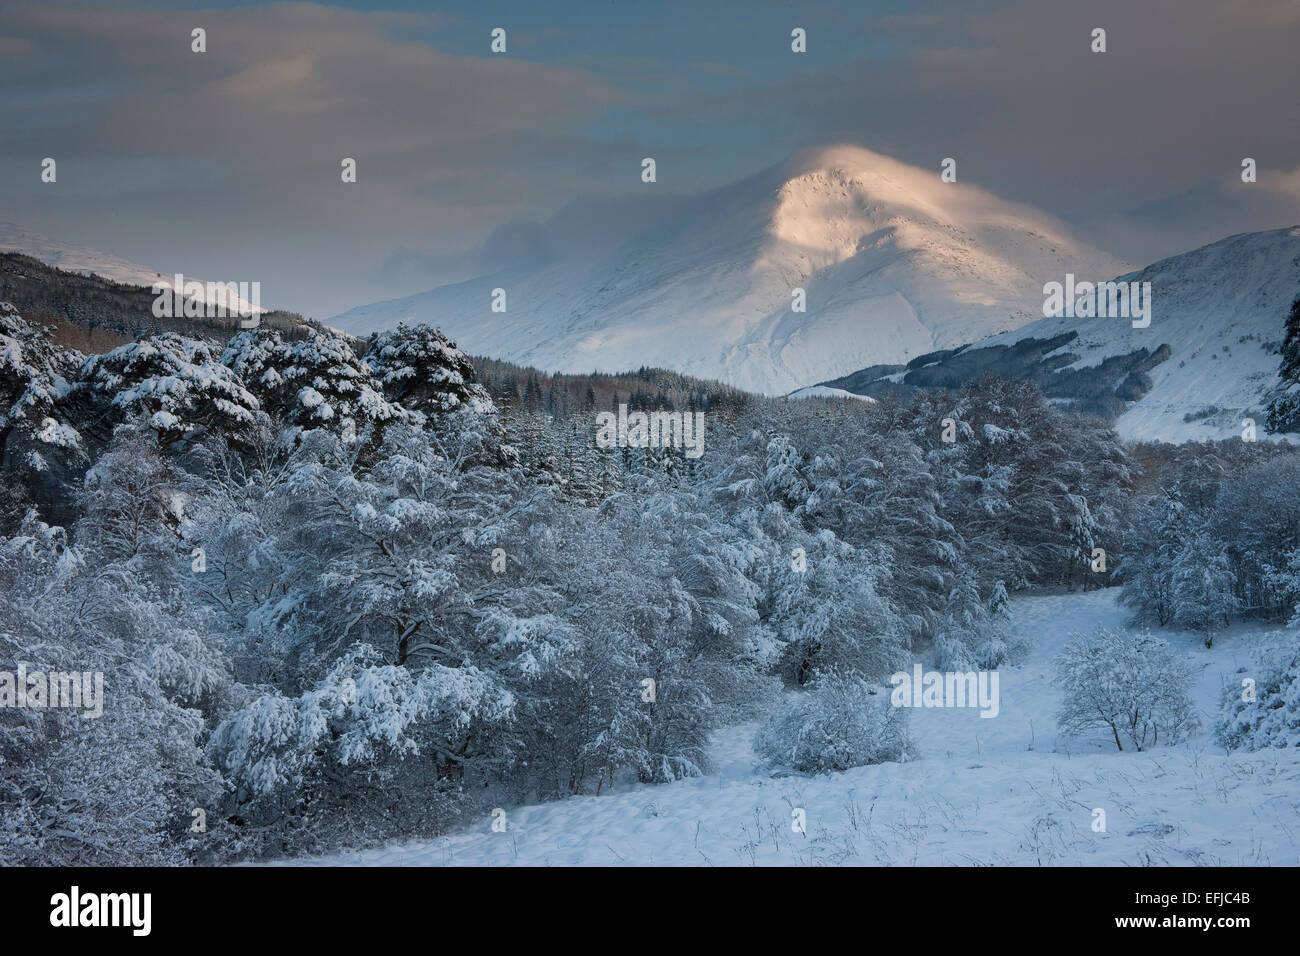 Winter view of Ben More, Crianlarich, Highlands - Stock Image